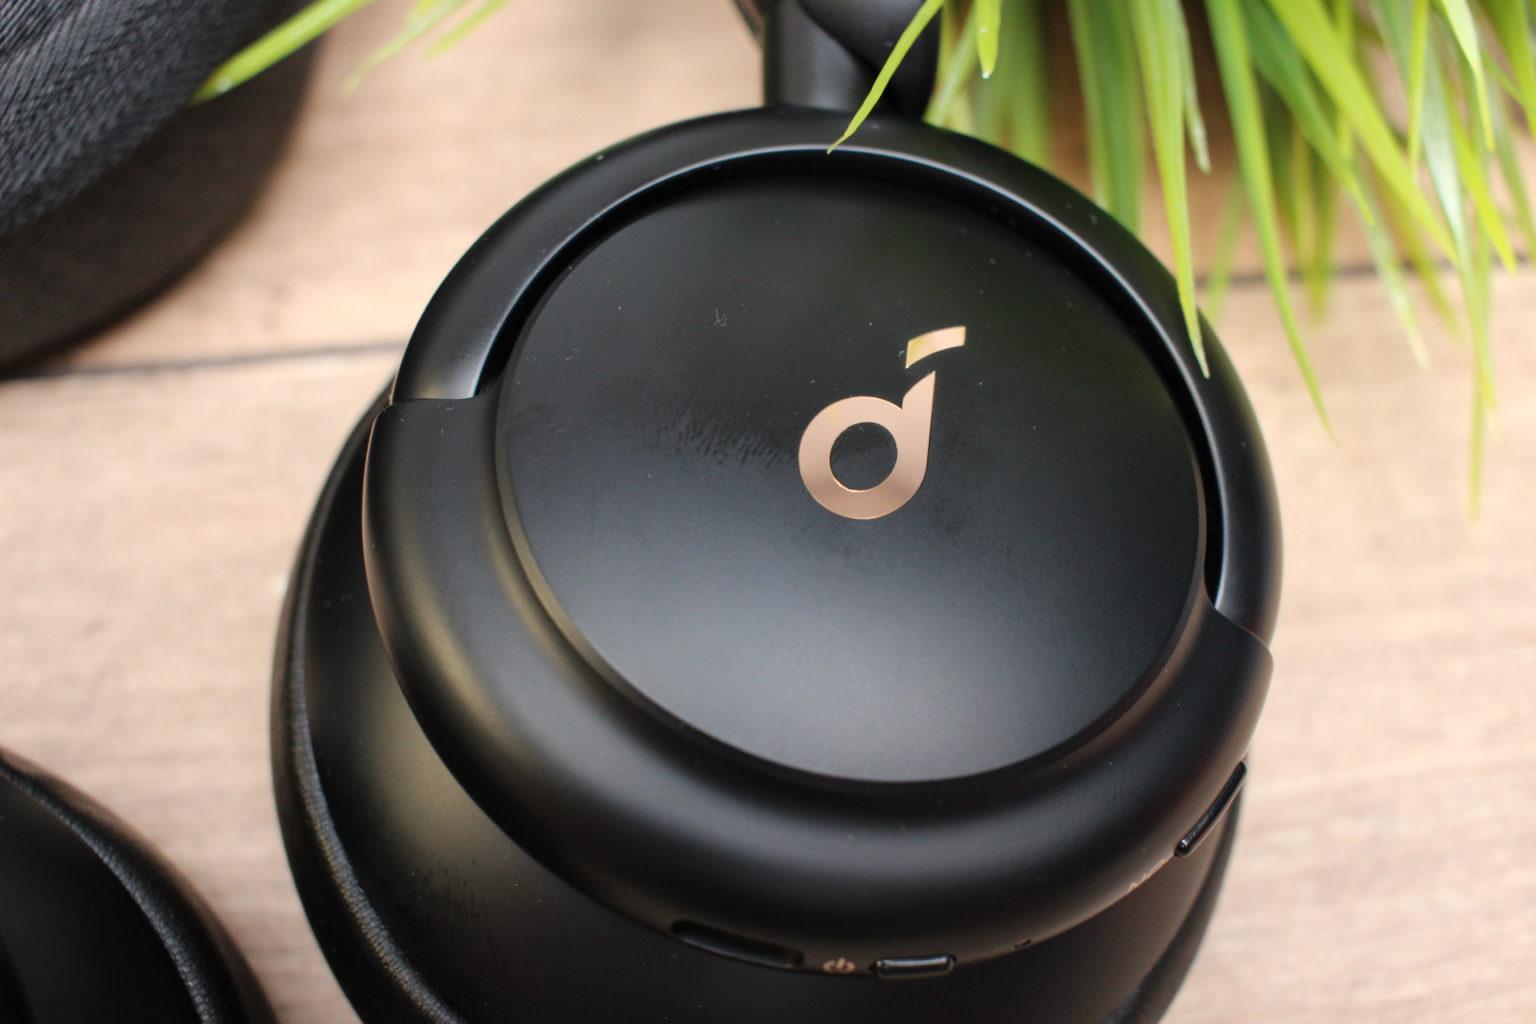 Logo Soundcore en el dorso de los auriculares bluetooth over-ear Soundcore Life Q30